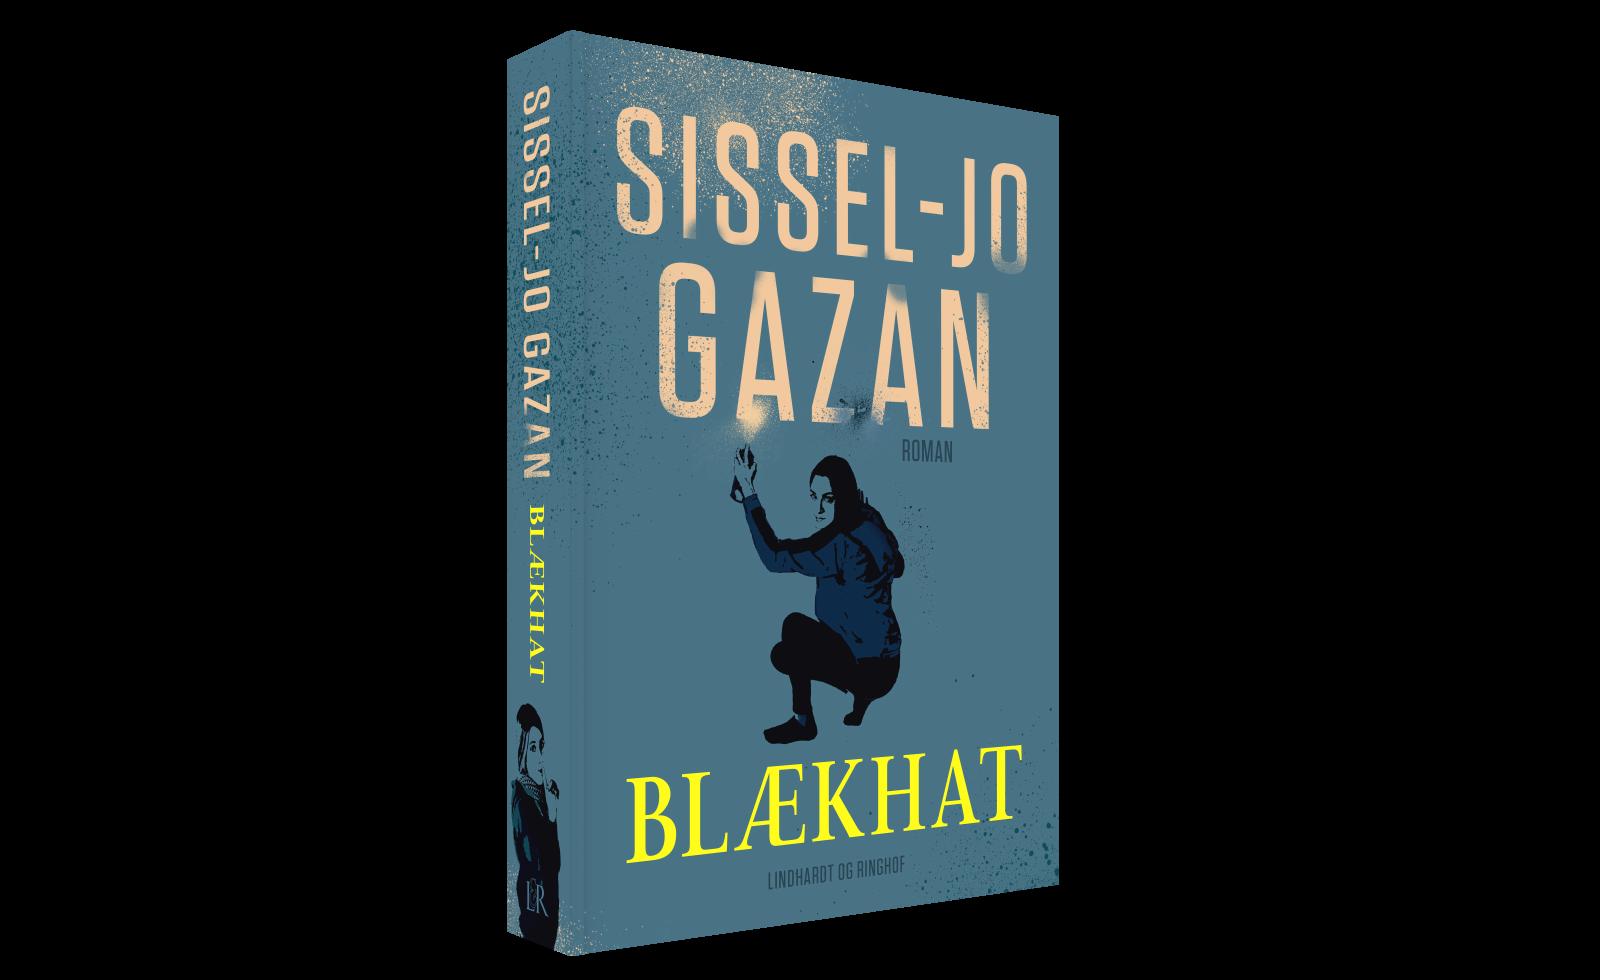 blækhat, Sissel-Jo Gazan, street art, spændingsroman,